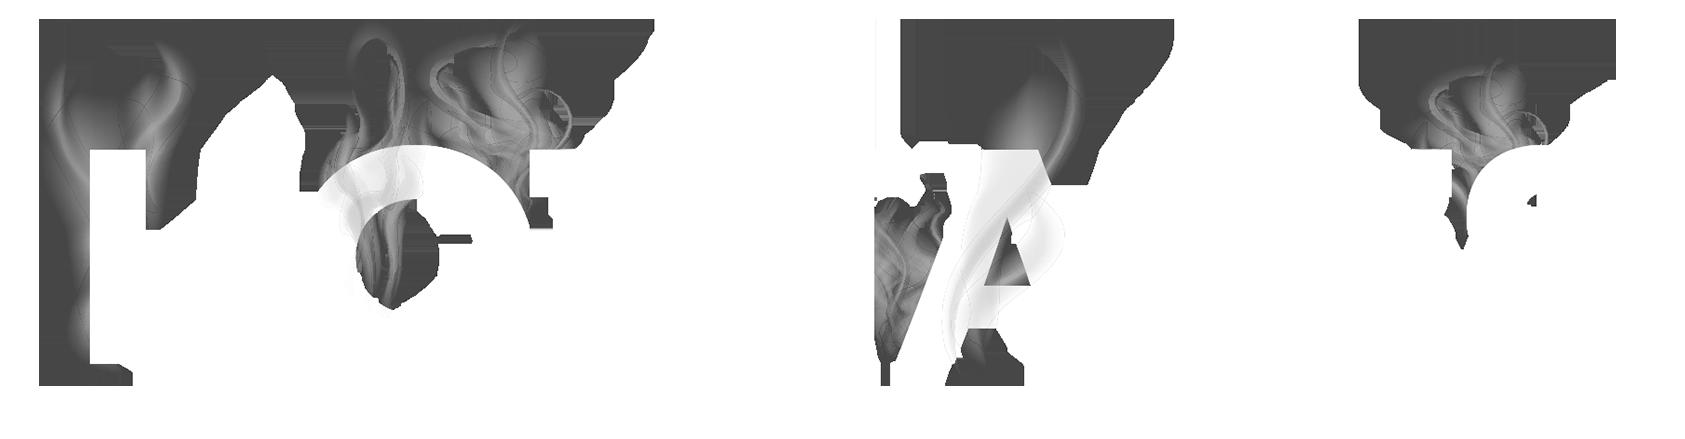 hot-takes-txt